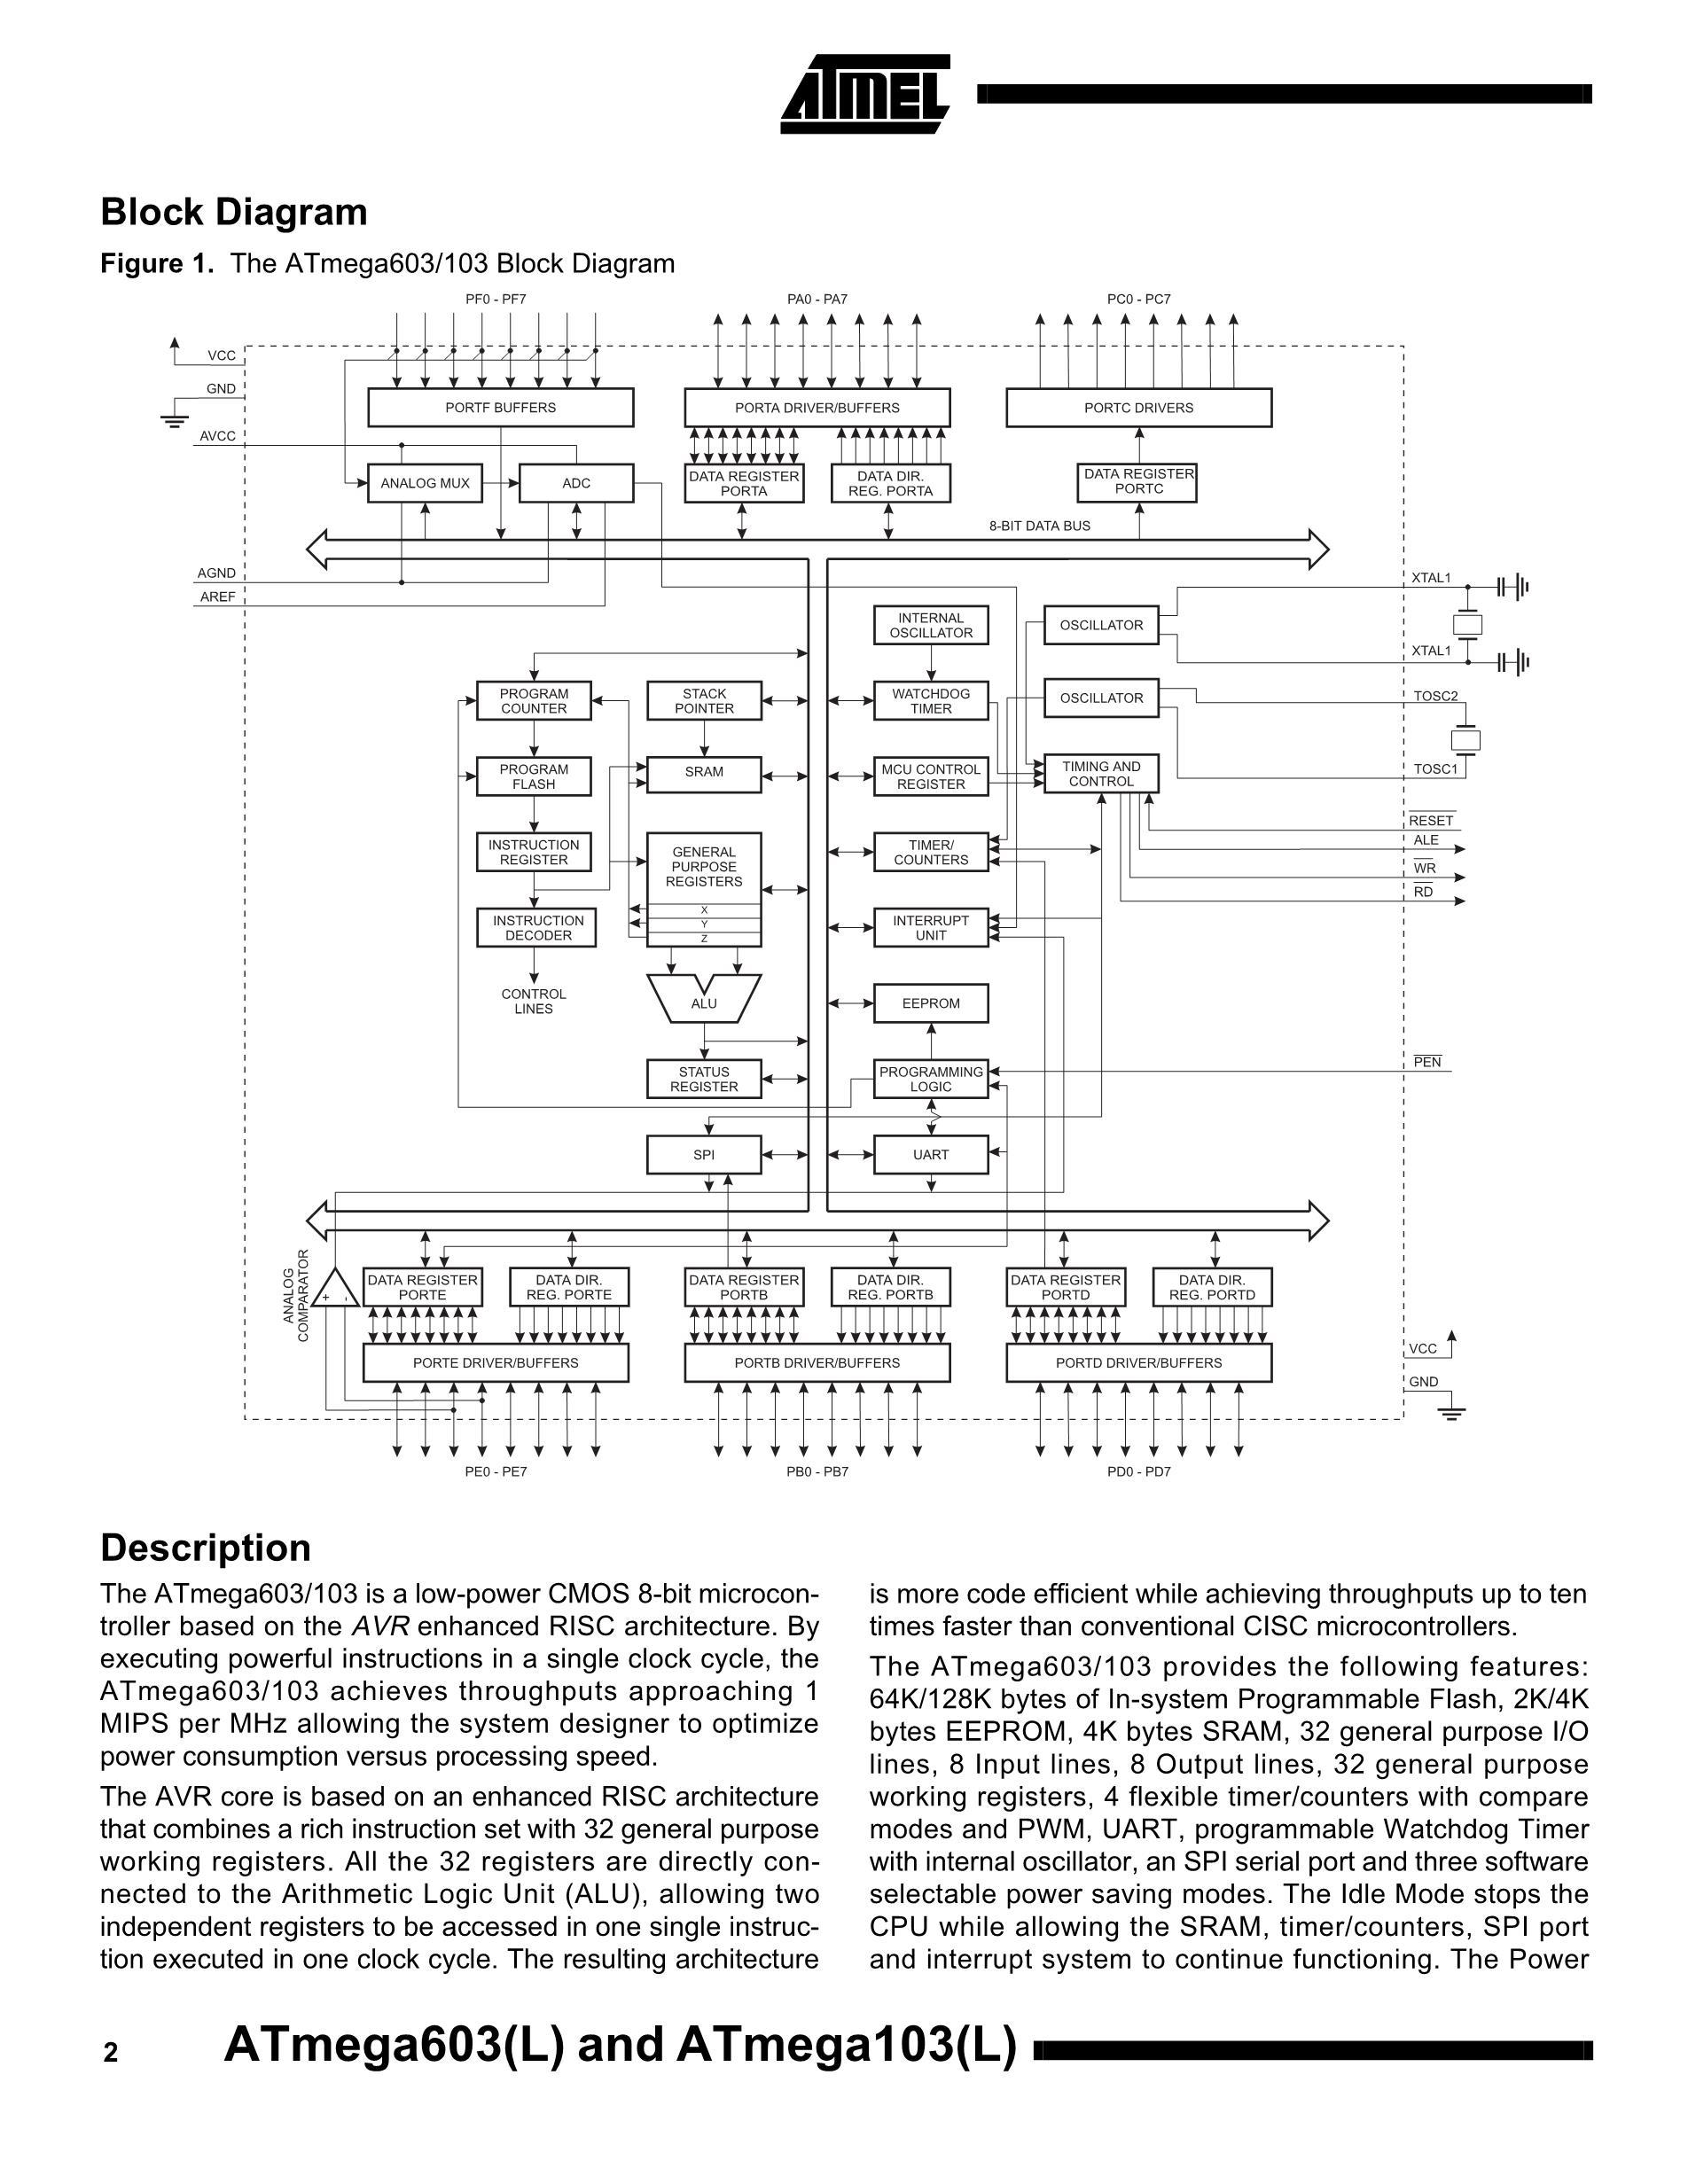 ATMEGA16U2-AU AVRVR ATMEGA8-BIT 16MHZ 16KB (8K X 16) FLASH 32-TQFP (7X7) 's pdf picture 2